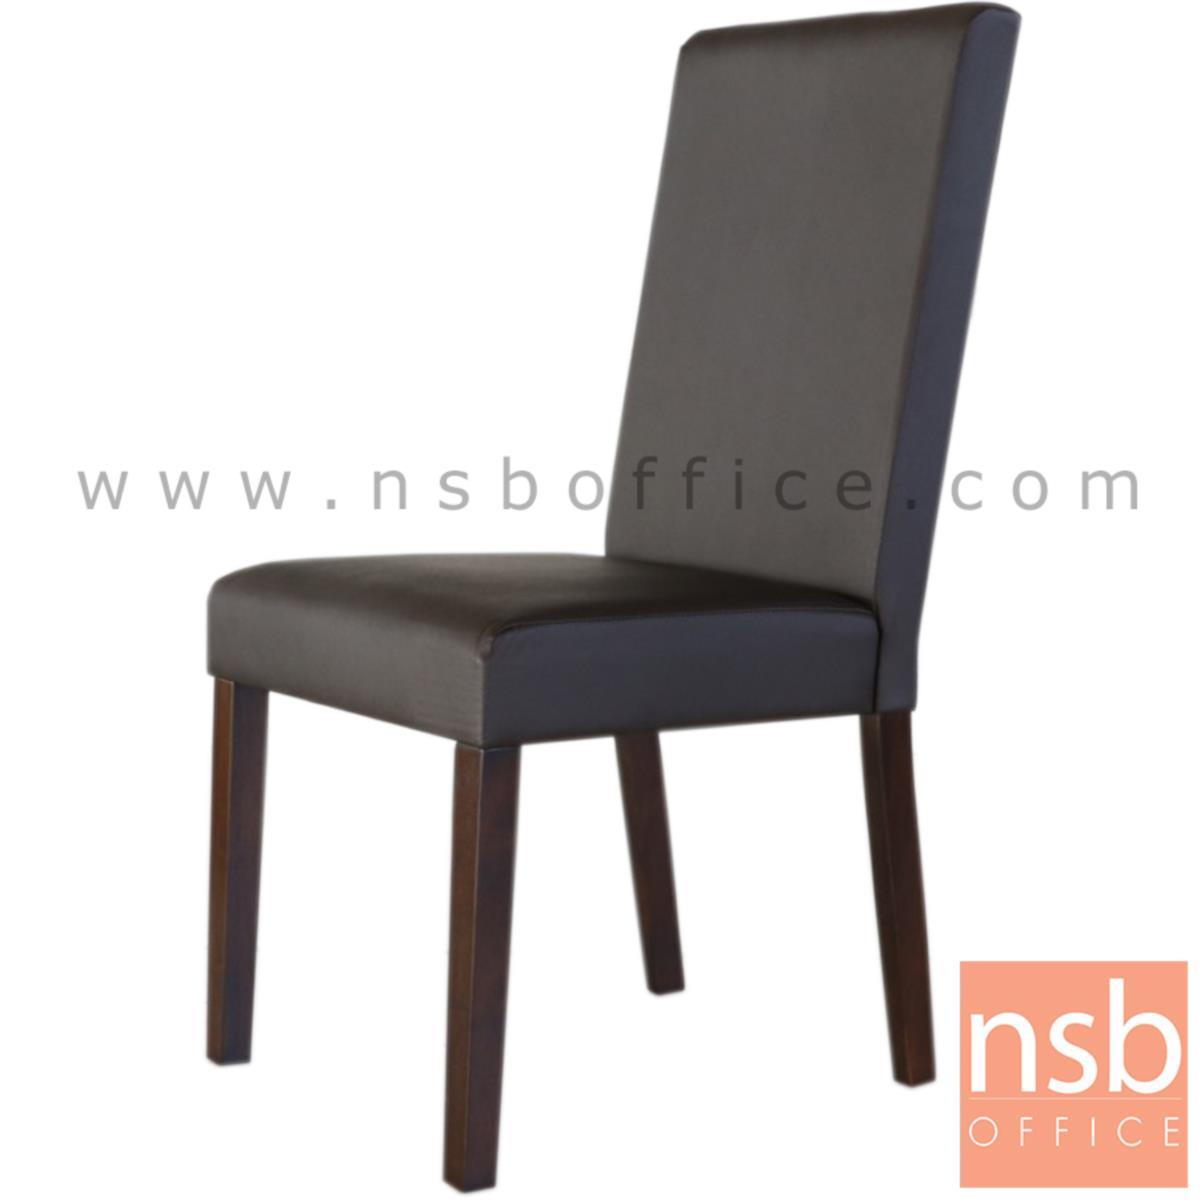 B22A167:เก้าอี้ไม้หุ้มหนัง PU รุ่น VIOLET (ไวโอเลต)  ขาไม้